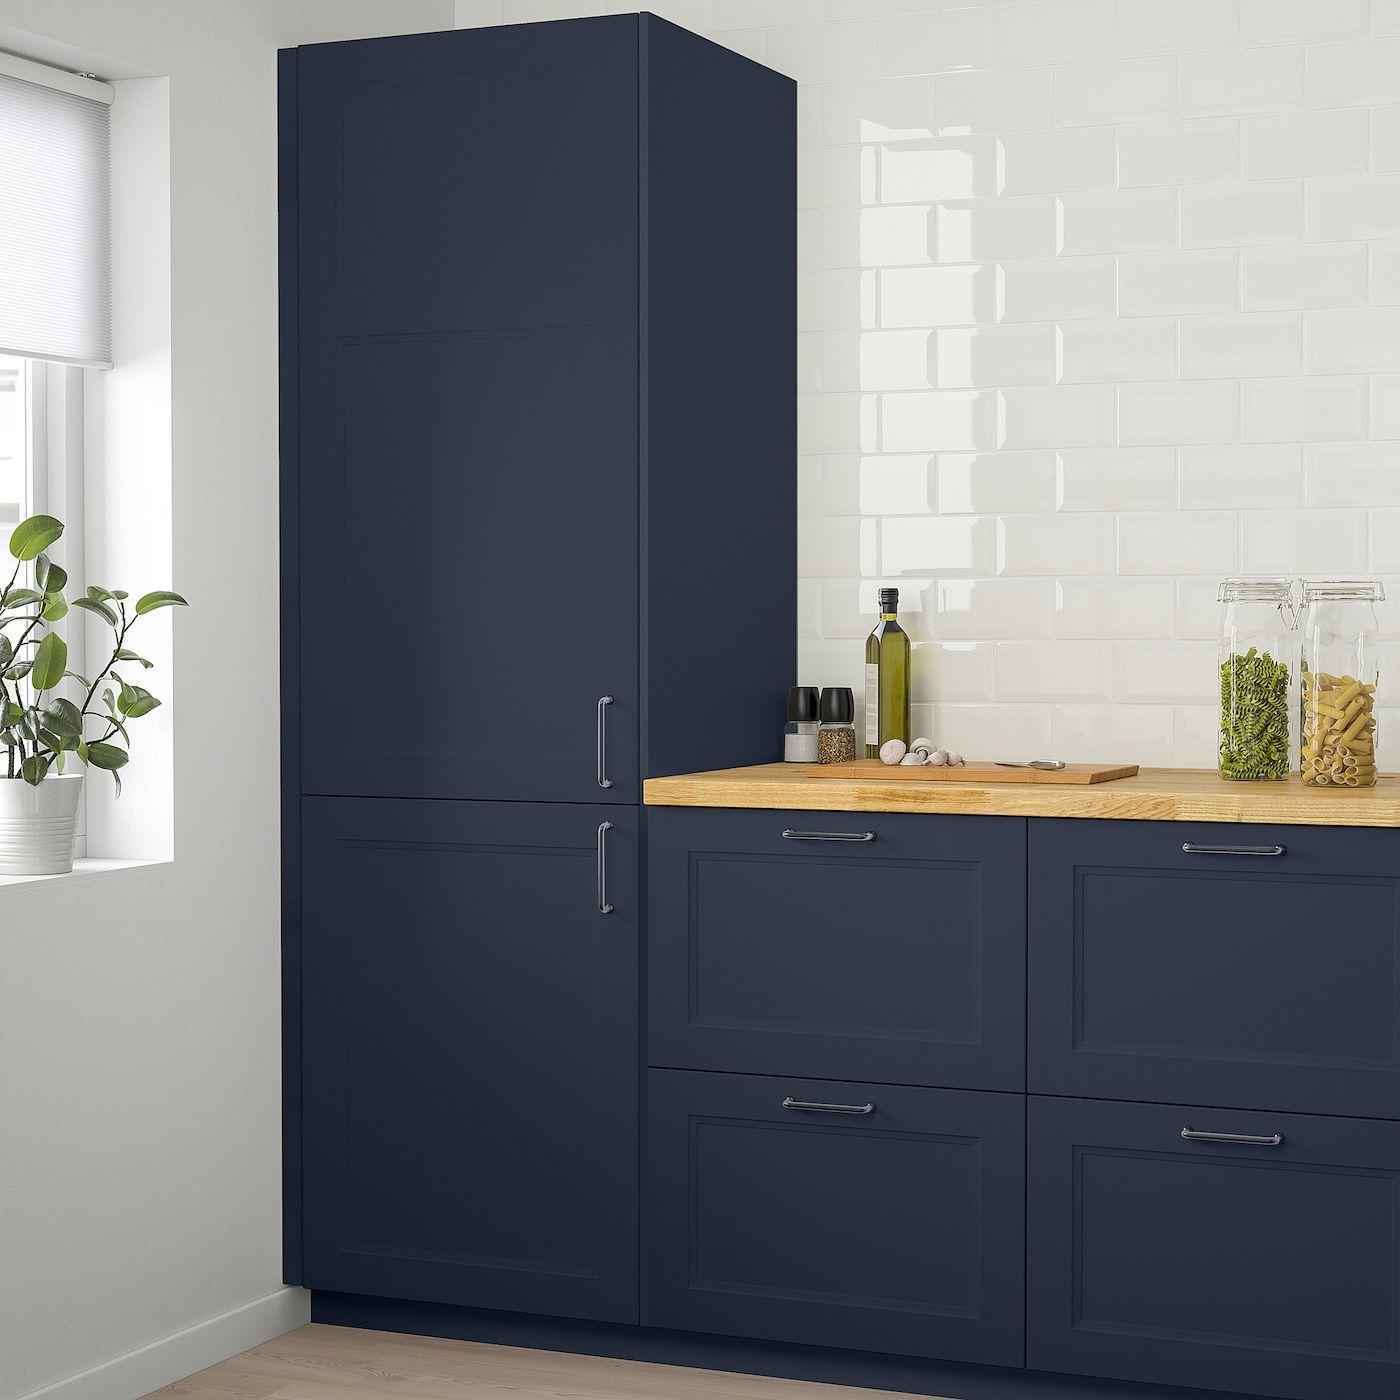 AXSTAD Cover panel - matte blue - IKEA in 2020 | Ikea ...